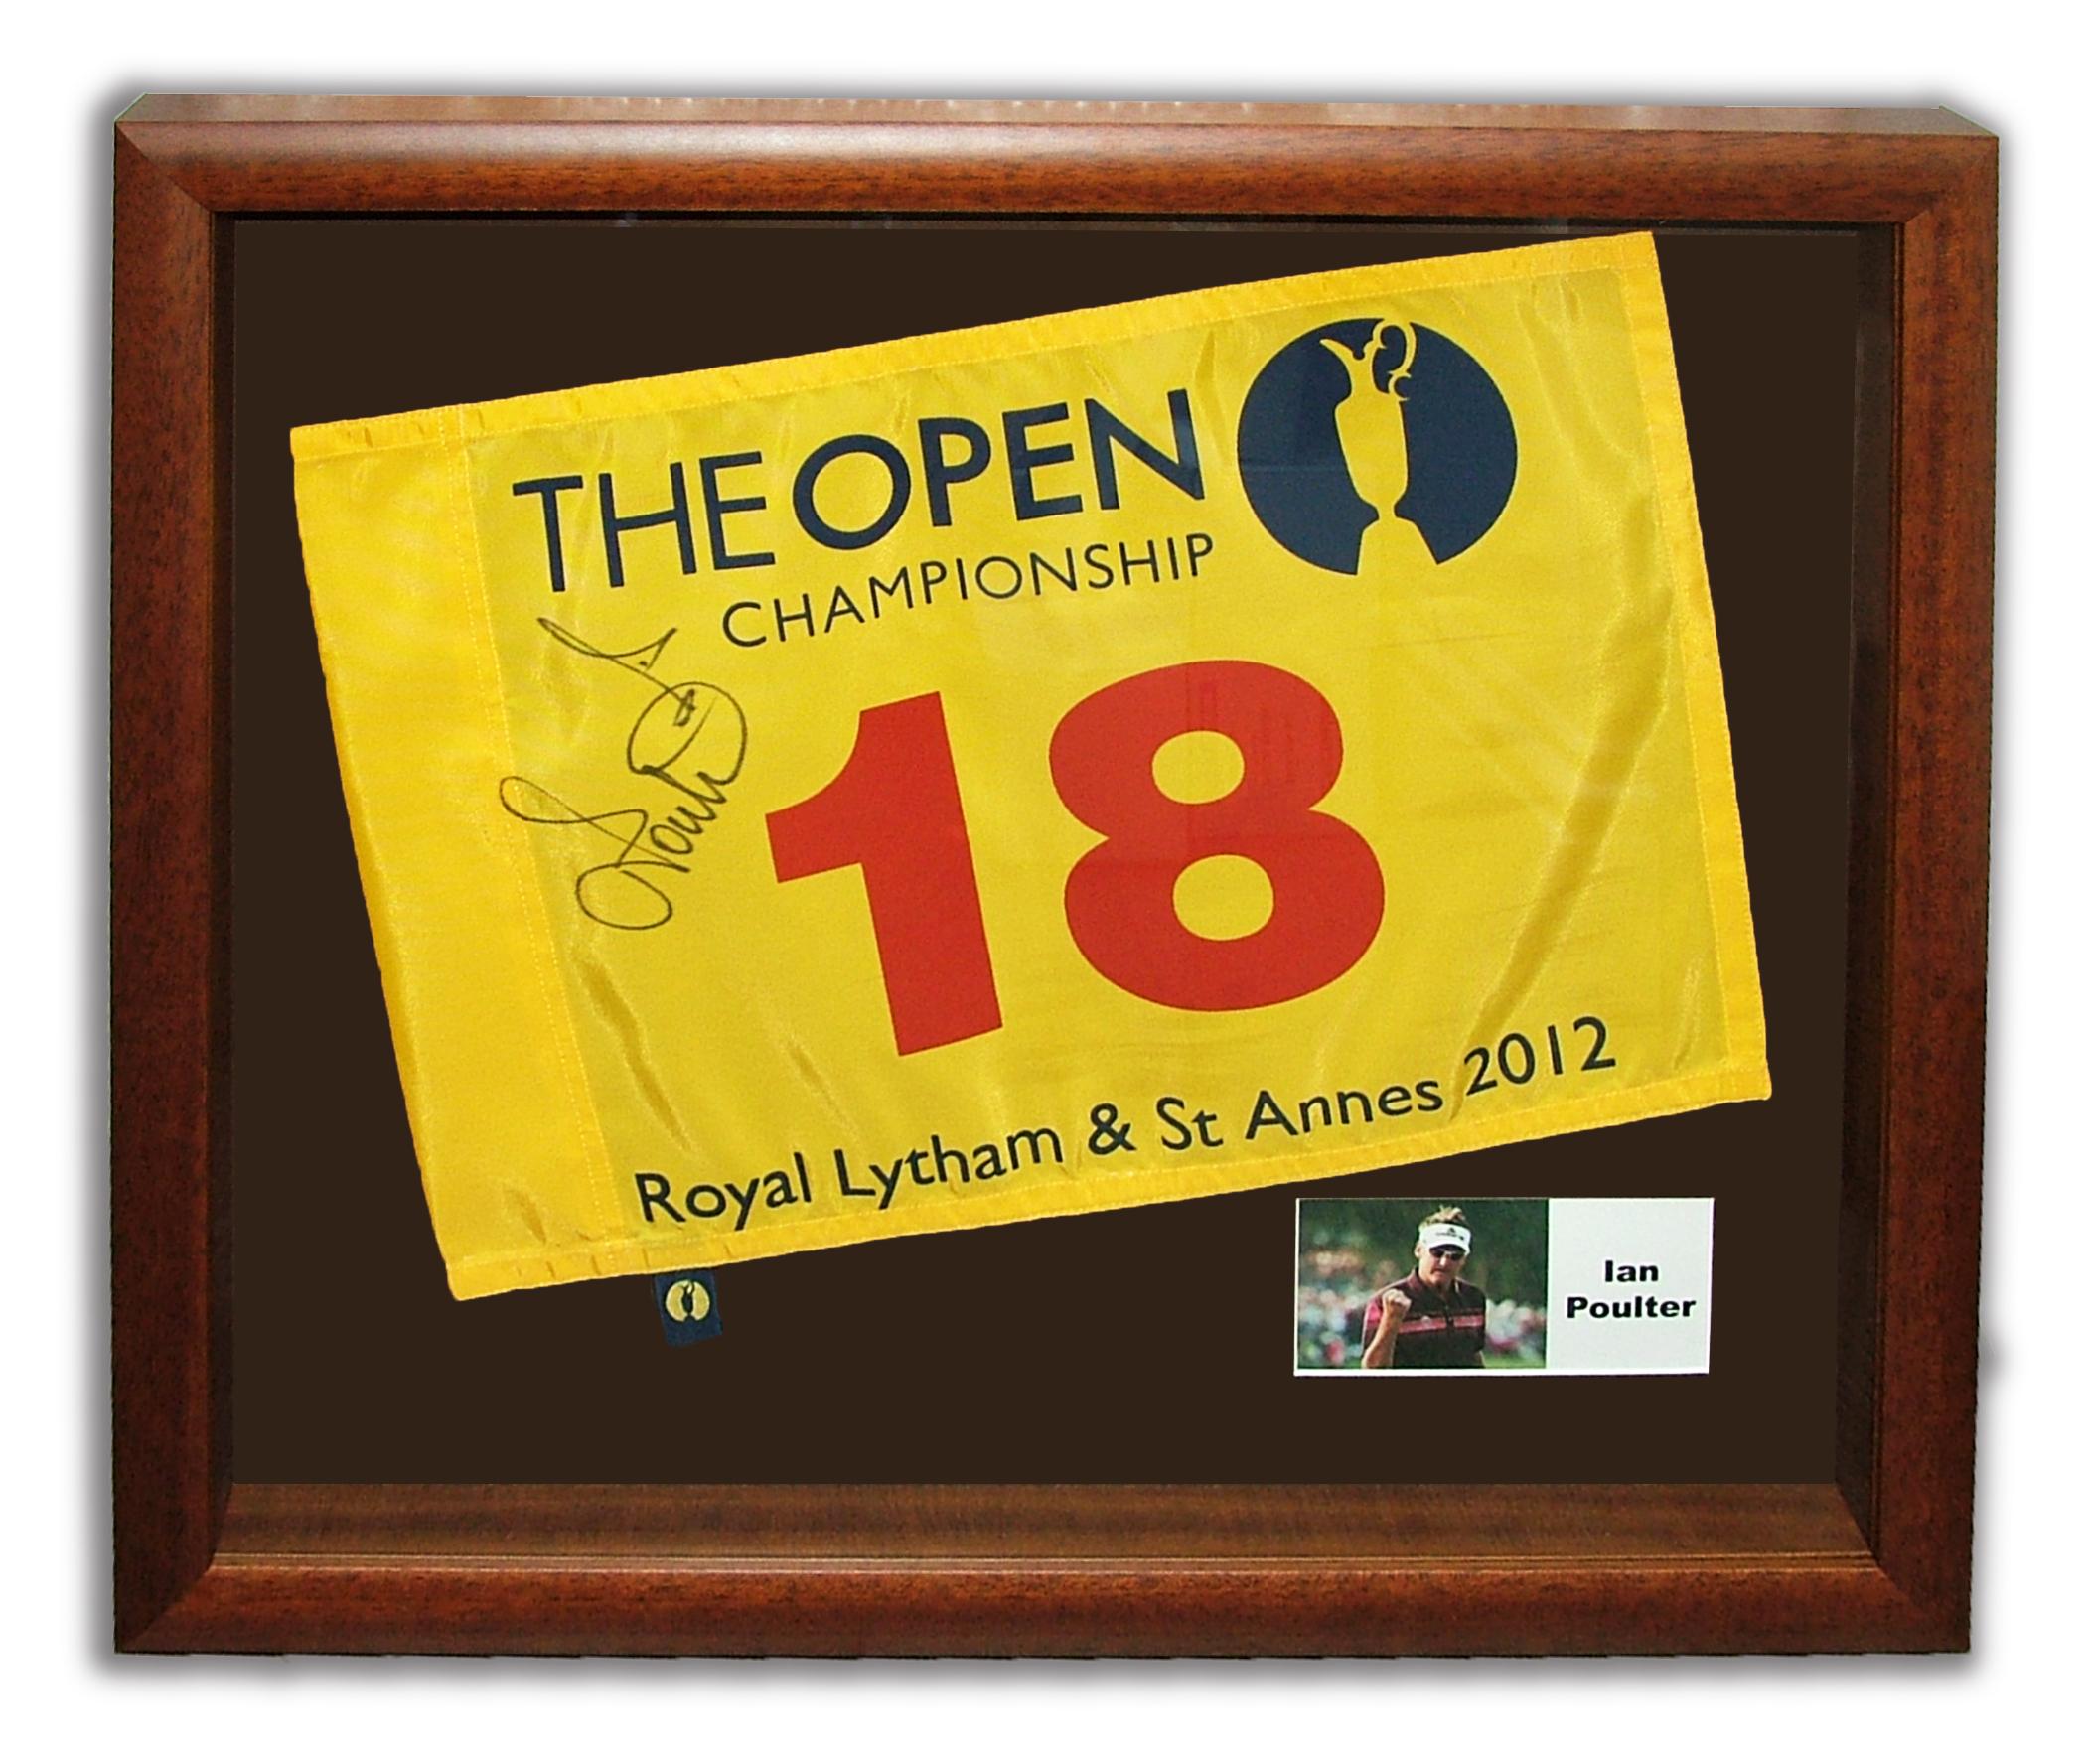 ian-poulter-18th-golf-flag-royal-lytham-st-annes-2012